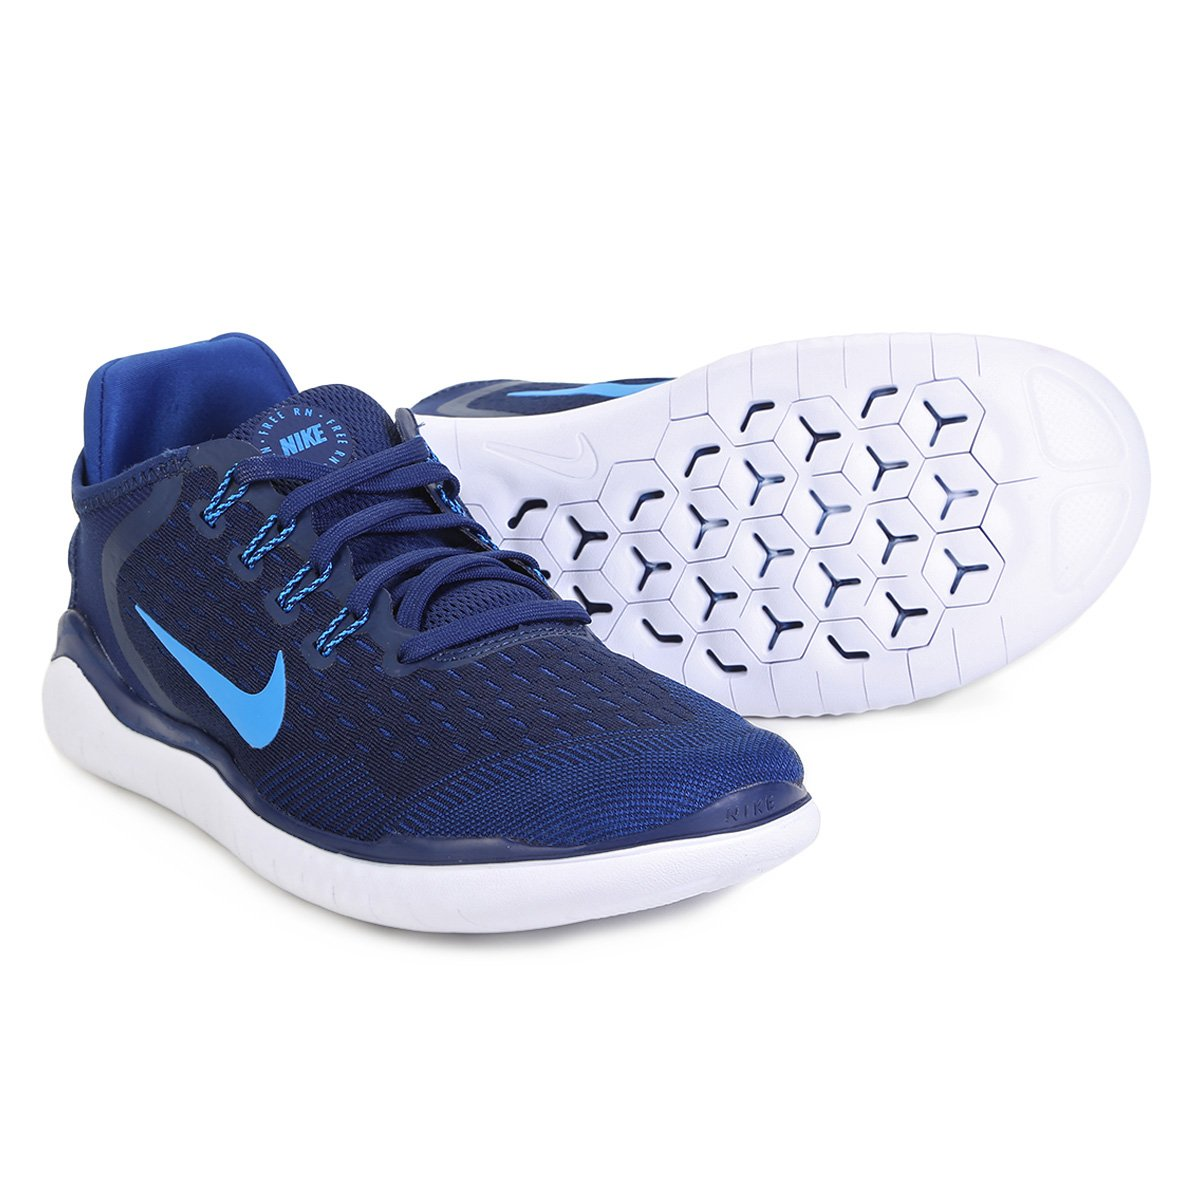 the best attitude 3c79b 13511 Tênis Nike Free Rn 2018 Masculino - Azul - Compre Agora  Net